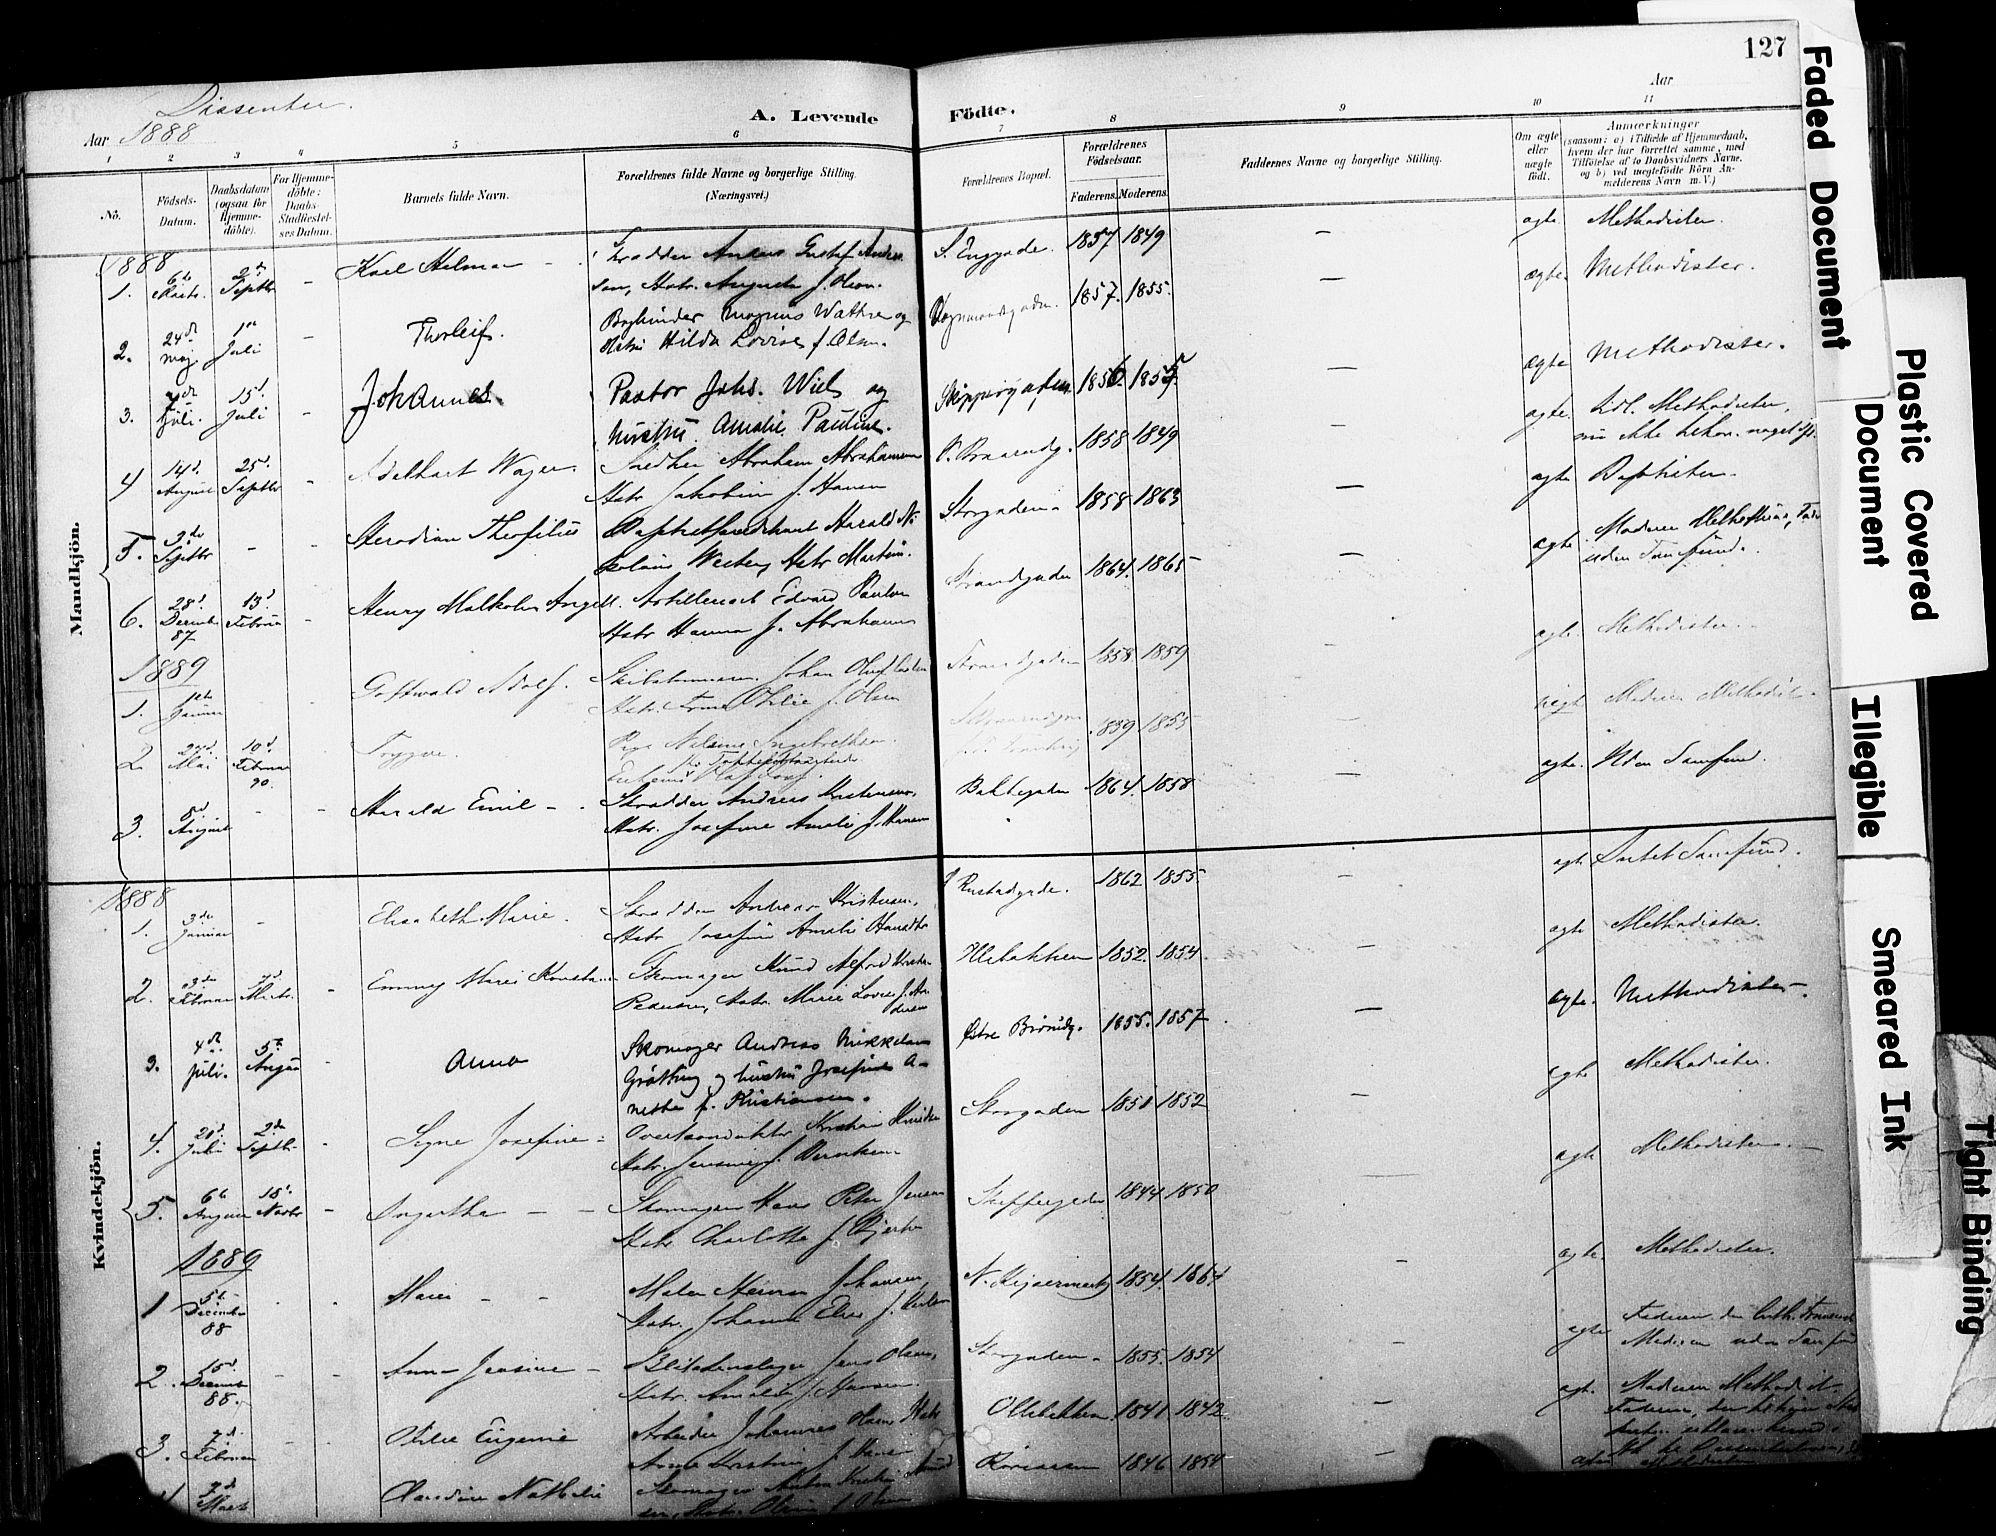 SAKO, Horten kirkebøker, F/Fa/L0004: Parish register (official) no. 4, 1888-1895, p. 127